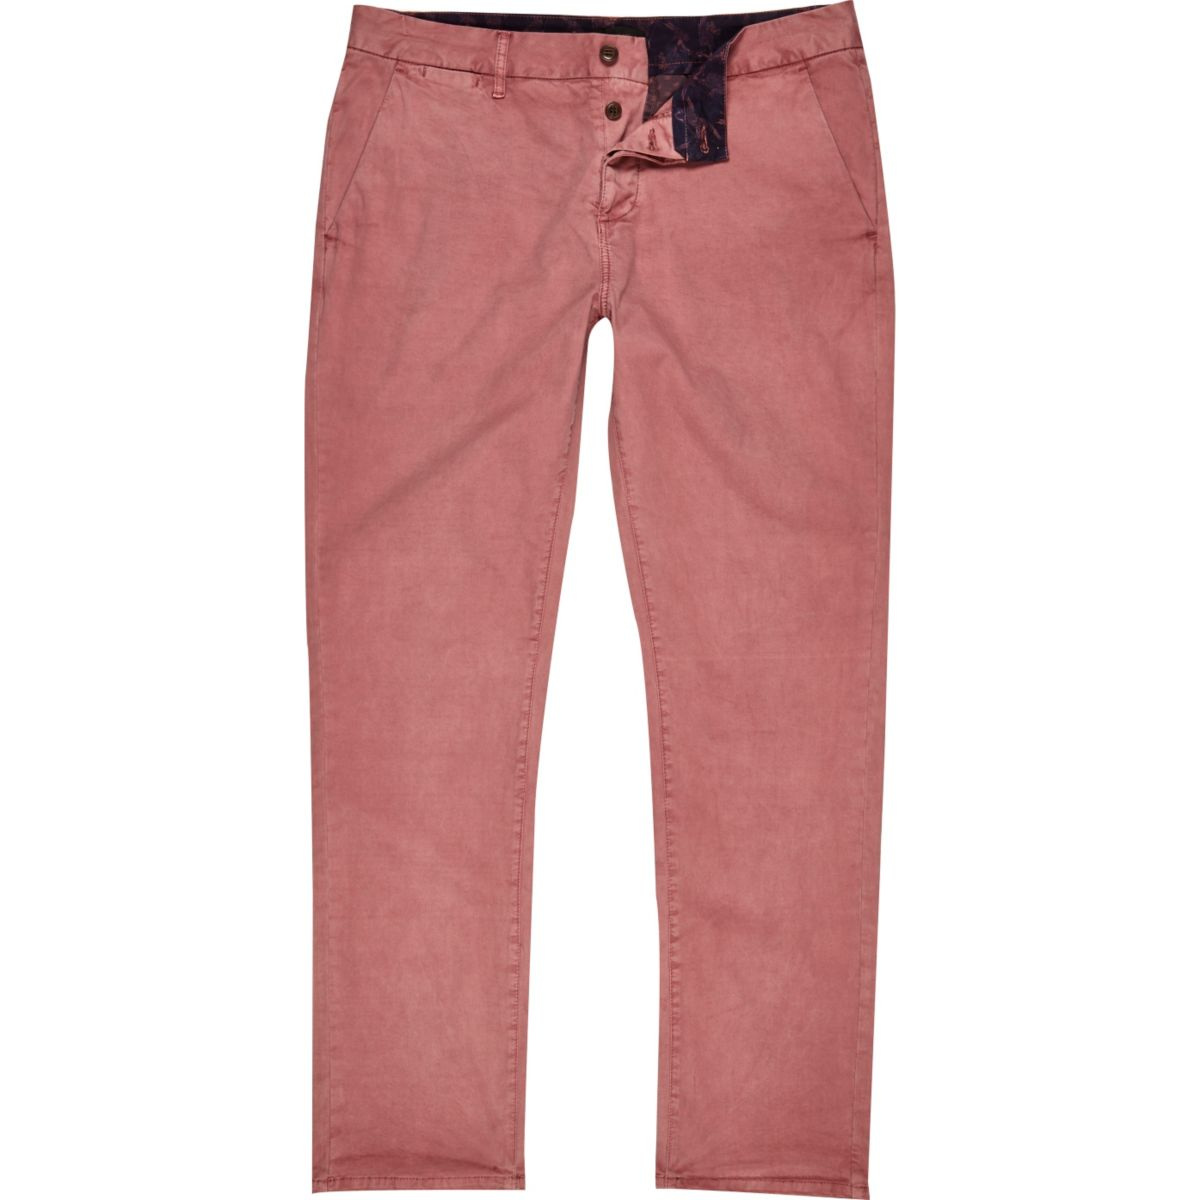 Pink slim chino trousers